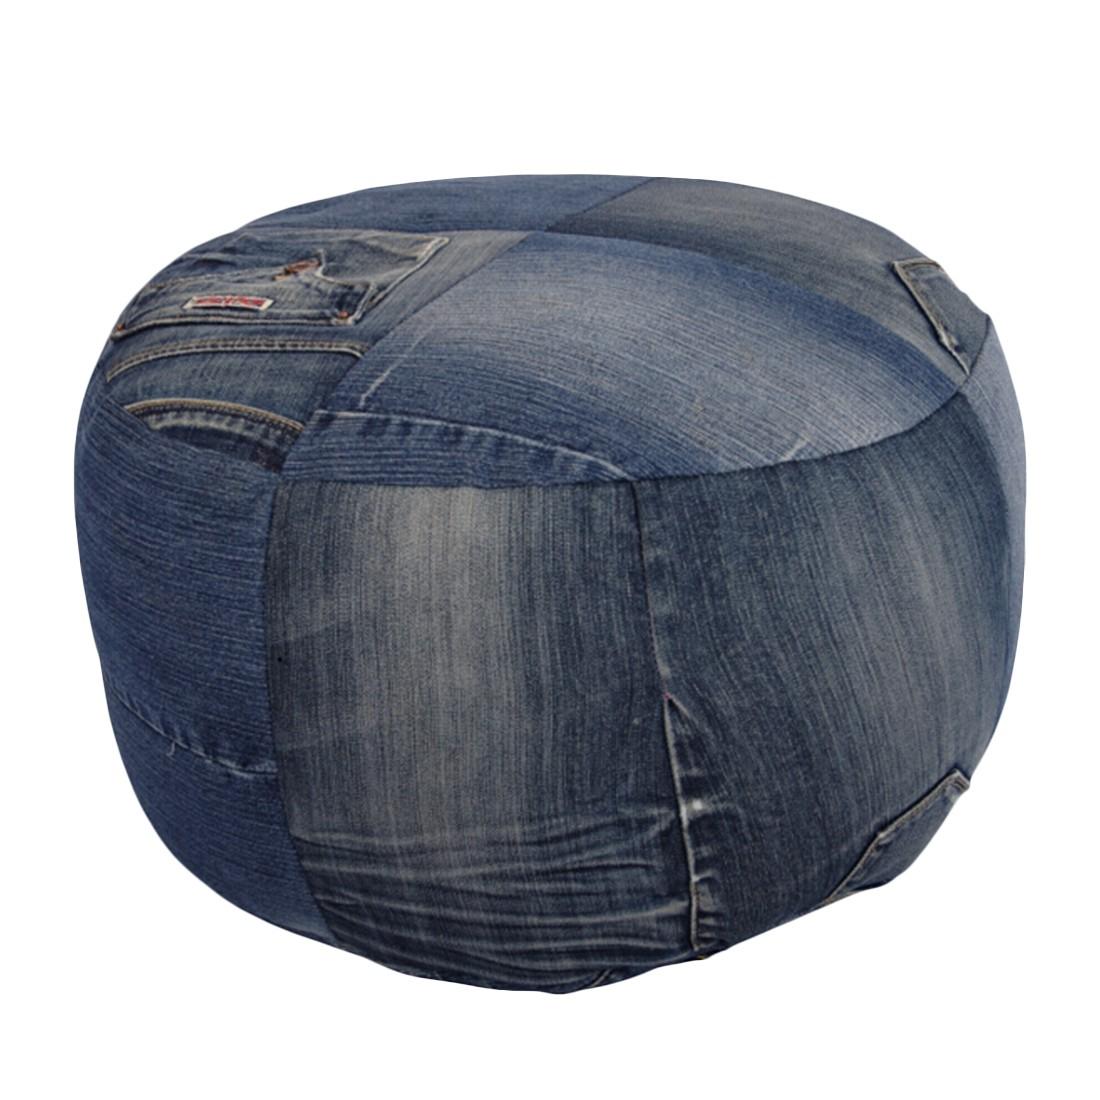 Pouf Jeans klein – 40 x 40 cm, KC-Handel günstig